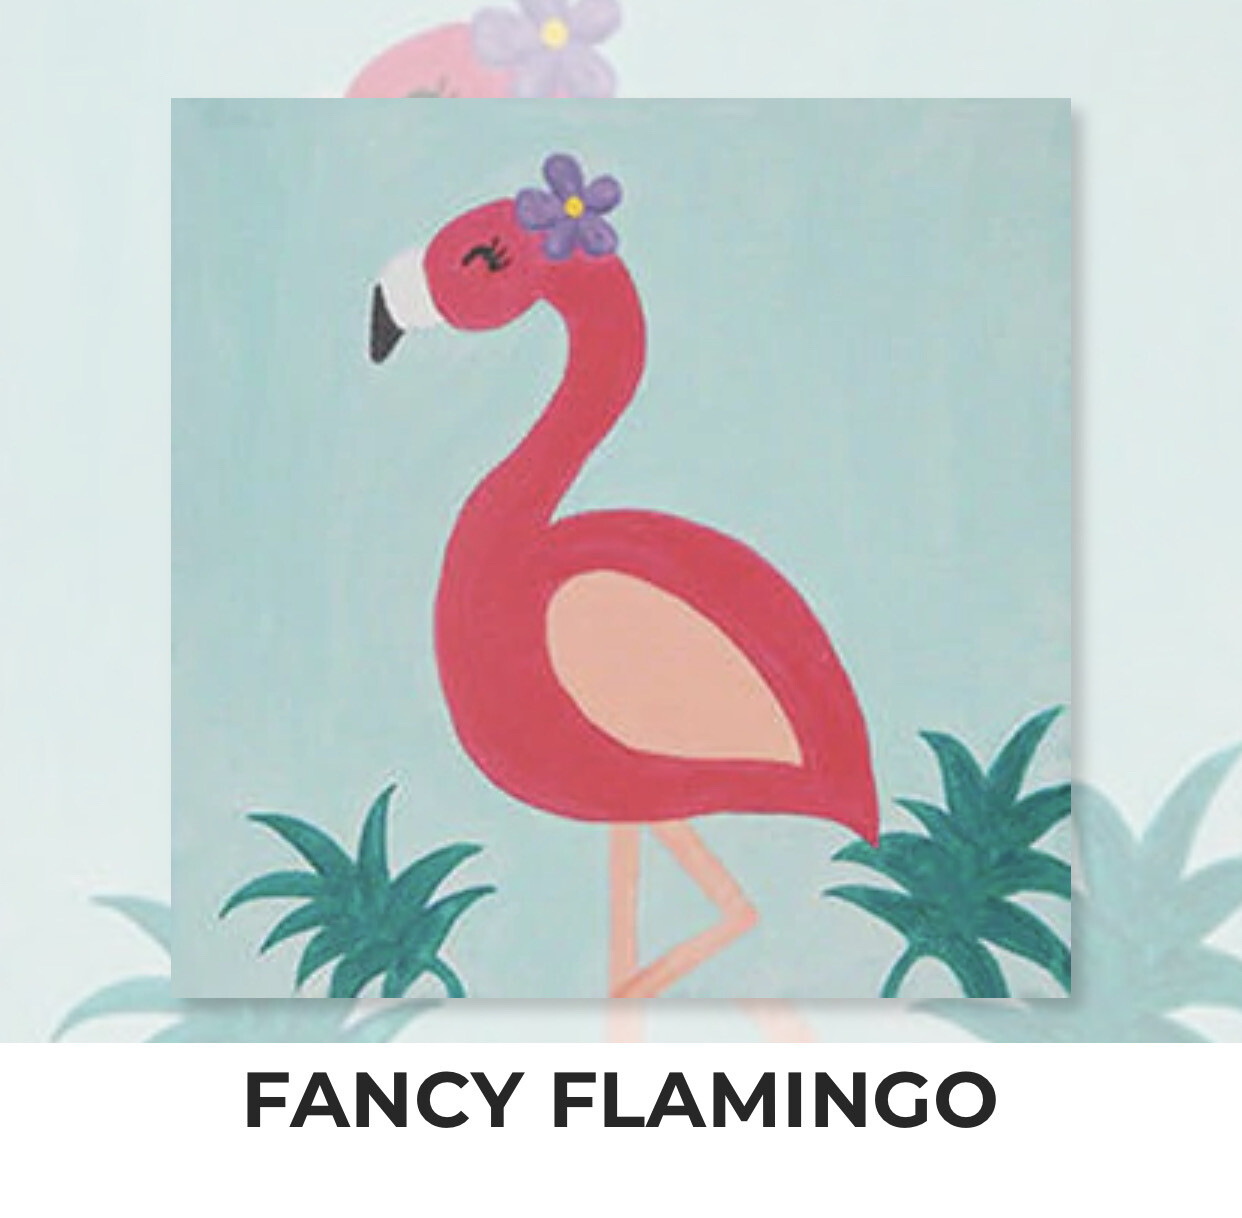 Fancy Flamingo KIDS Acrylic Paint On Canvas DIY Art Kit - 3 Week Special Order